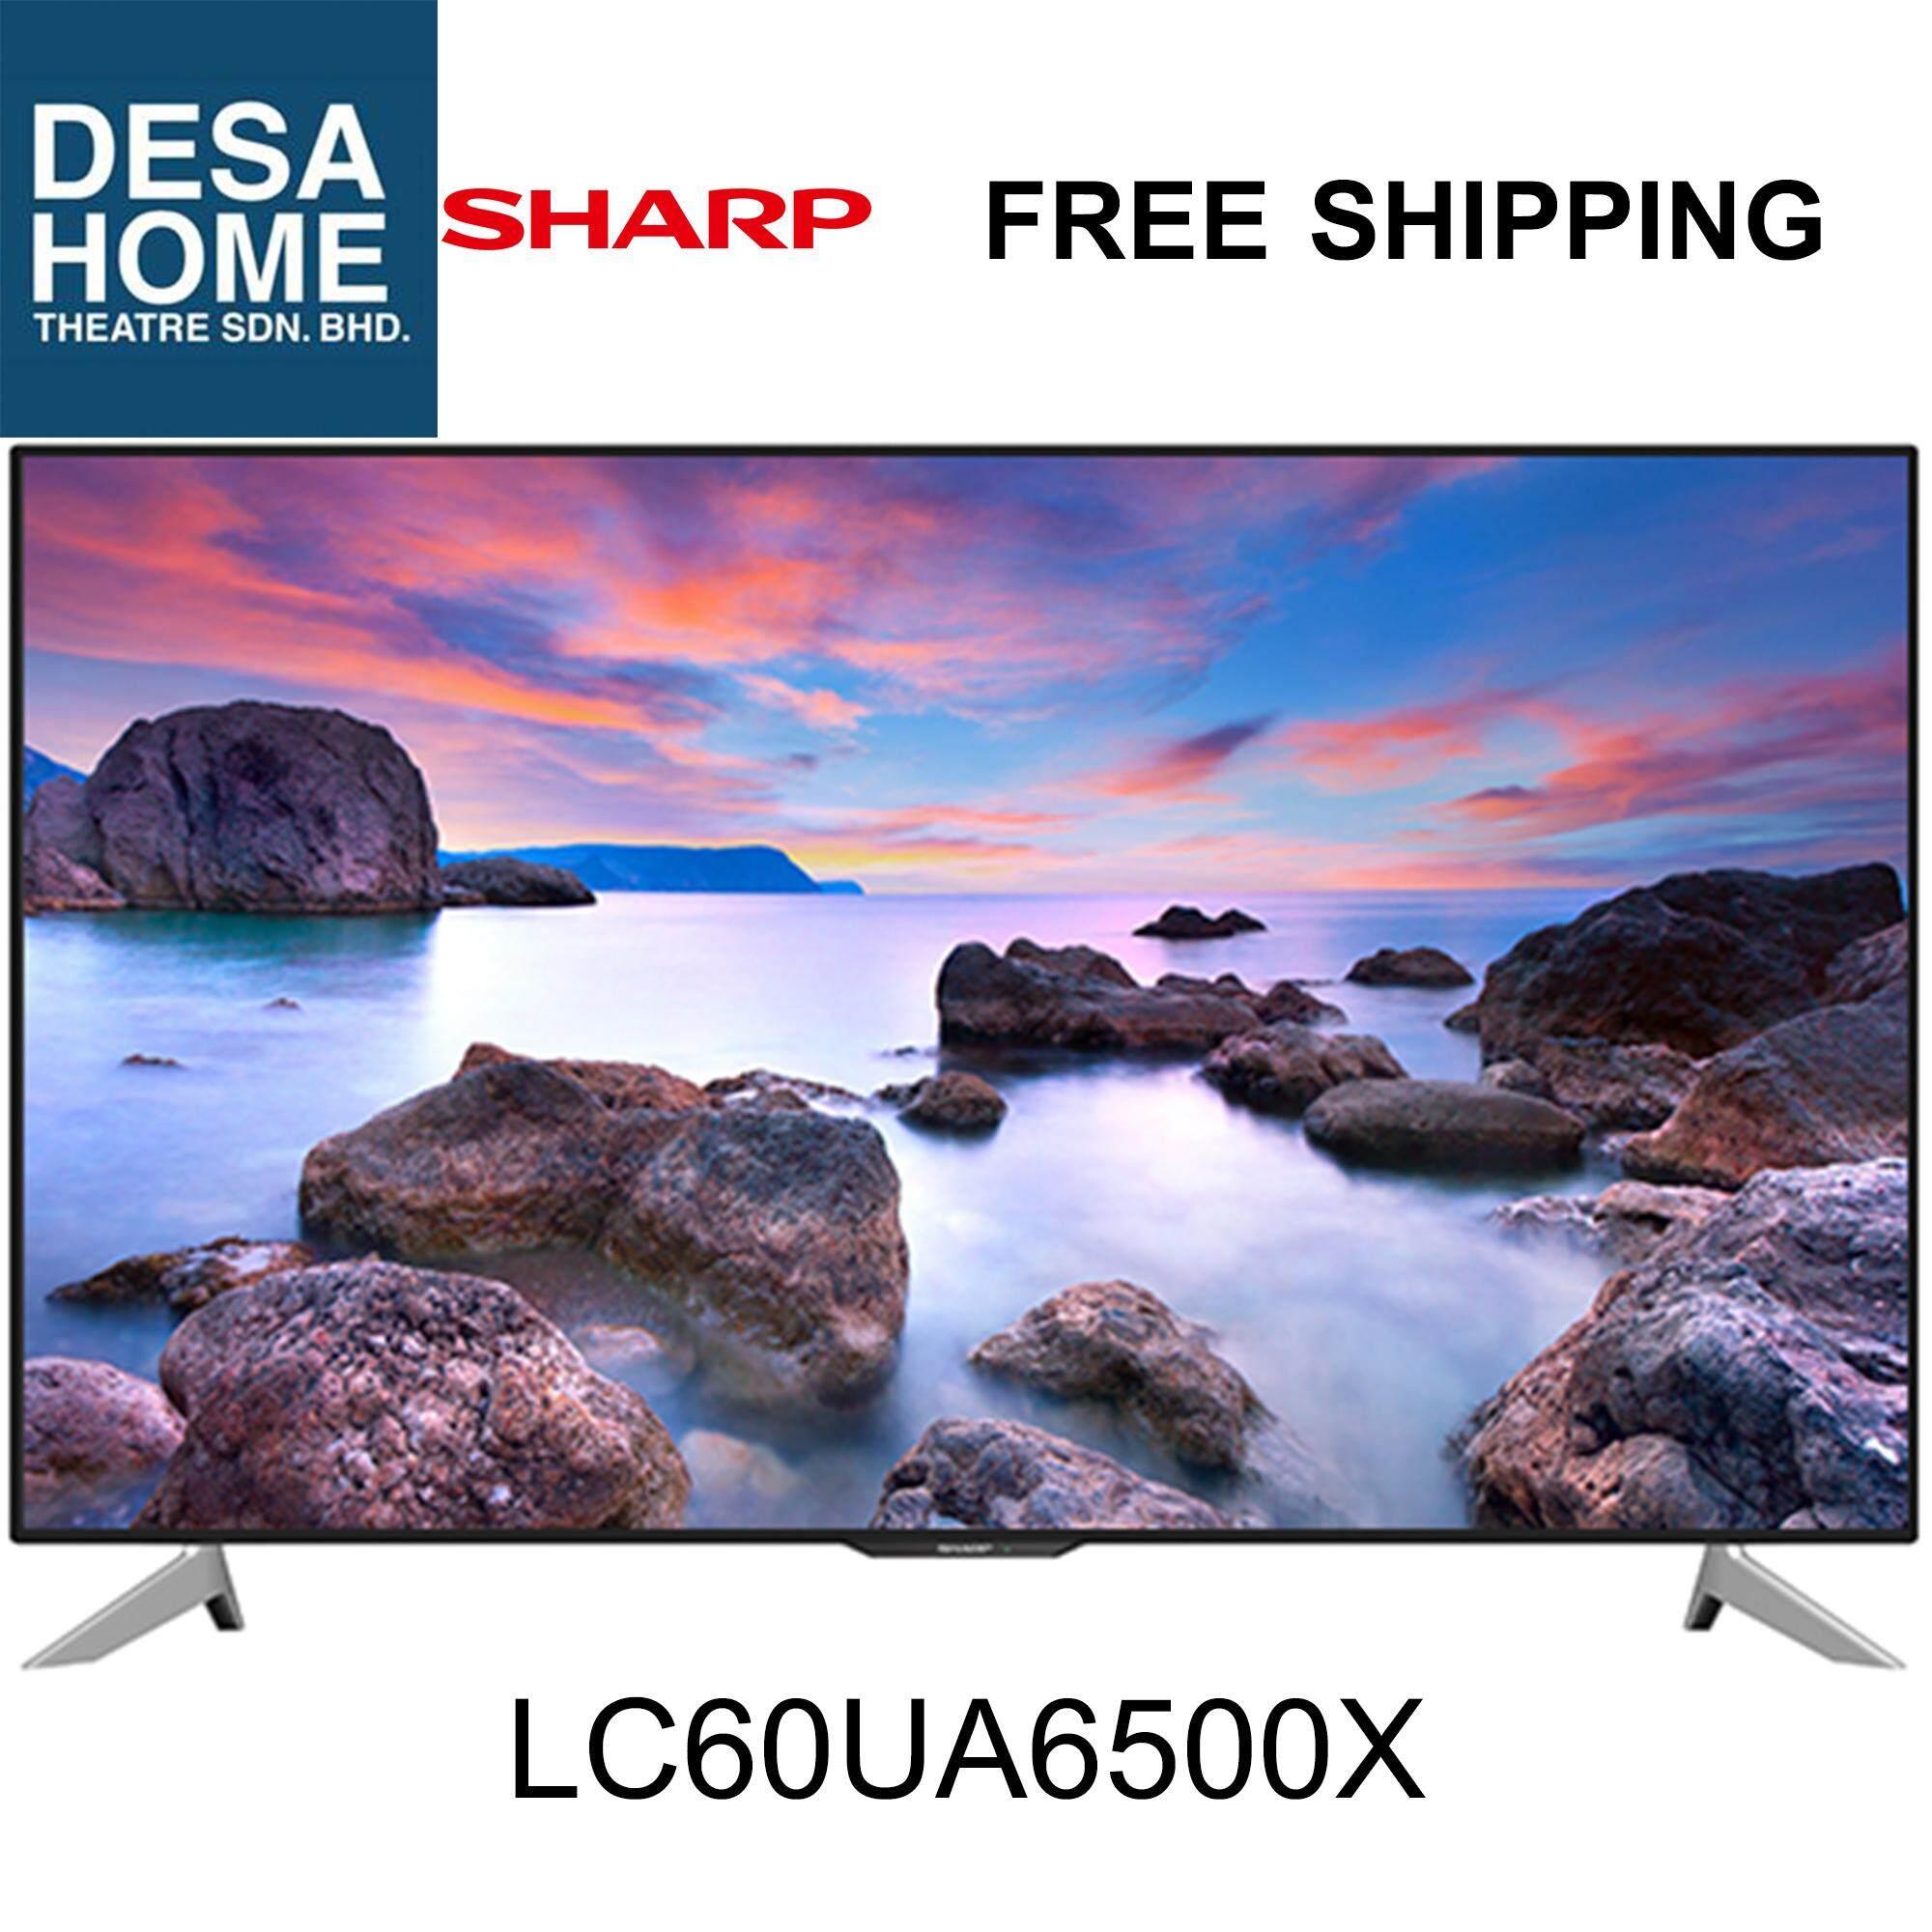 Sharp LC60UA6500X 4k UHD Easy Smart Slim LED TV 60